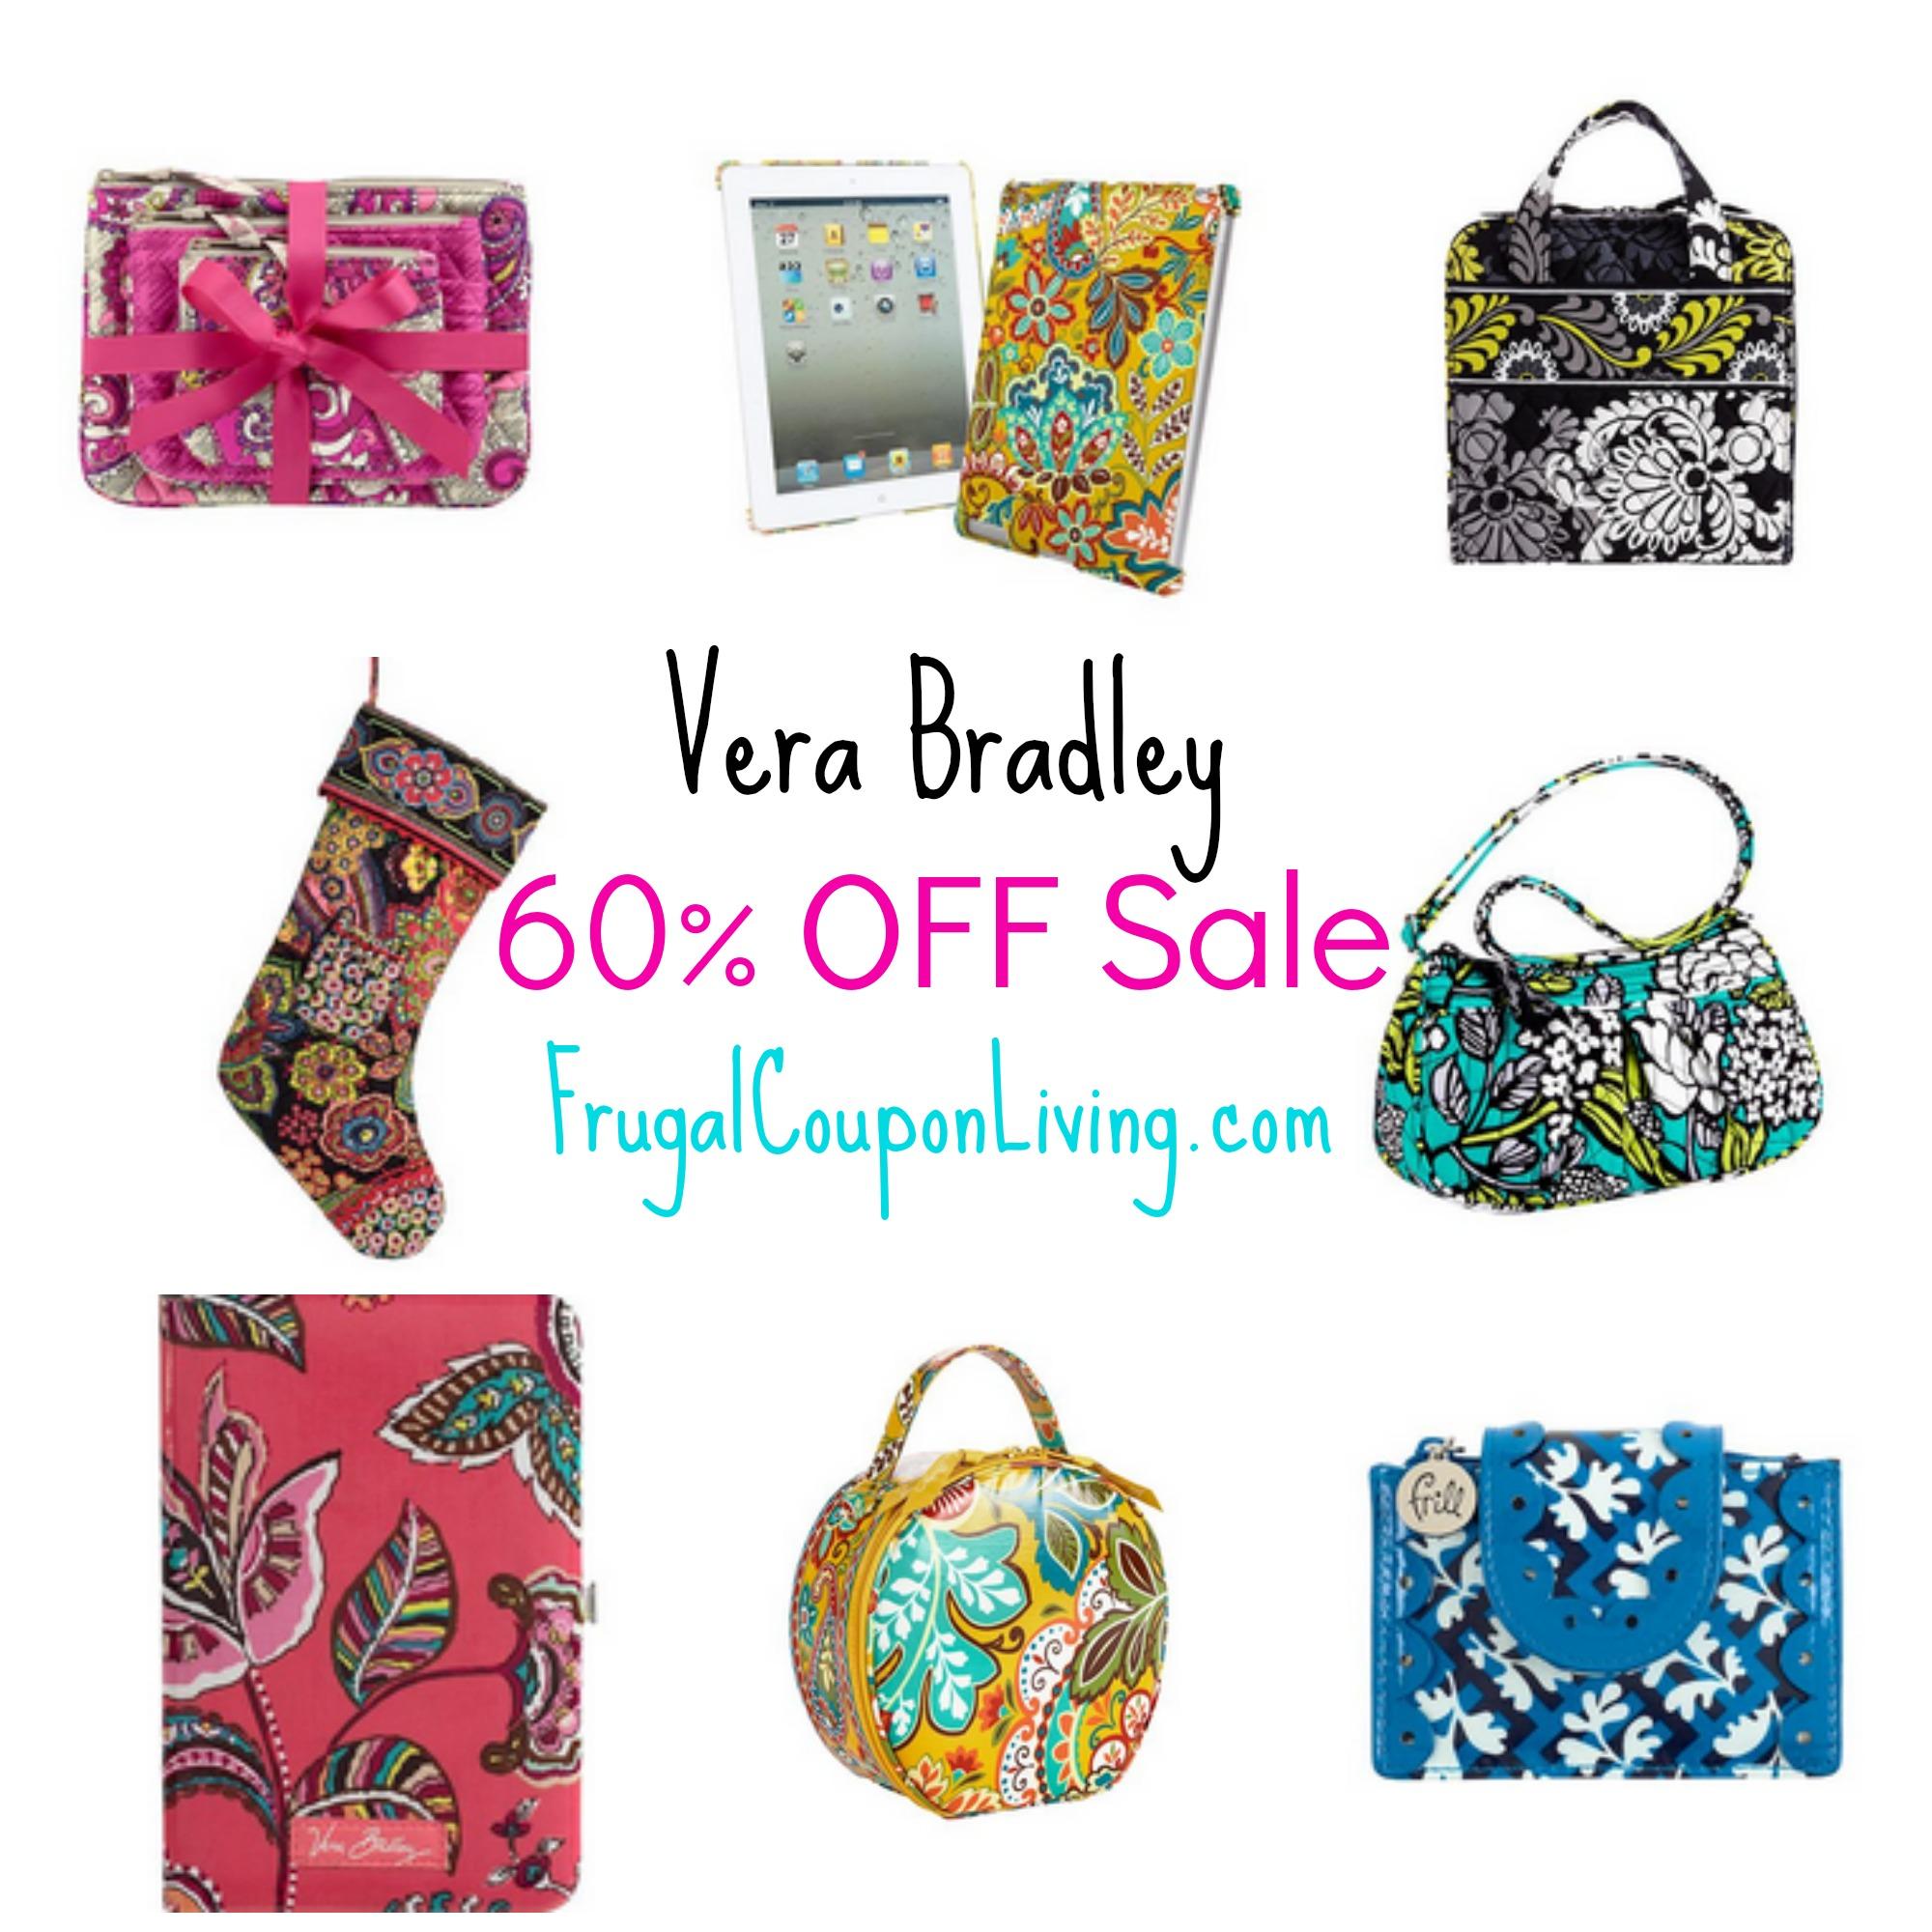 Vera bradley discount coupons